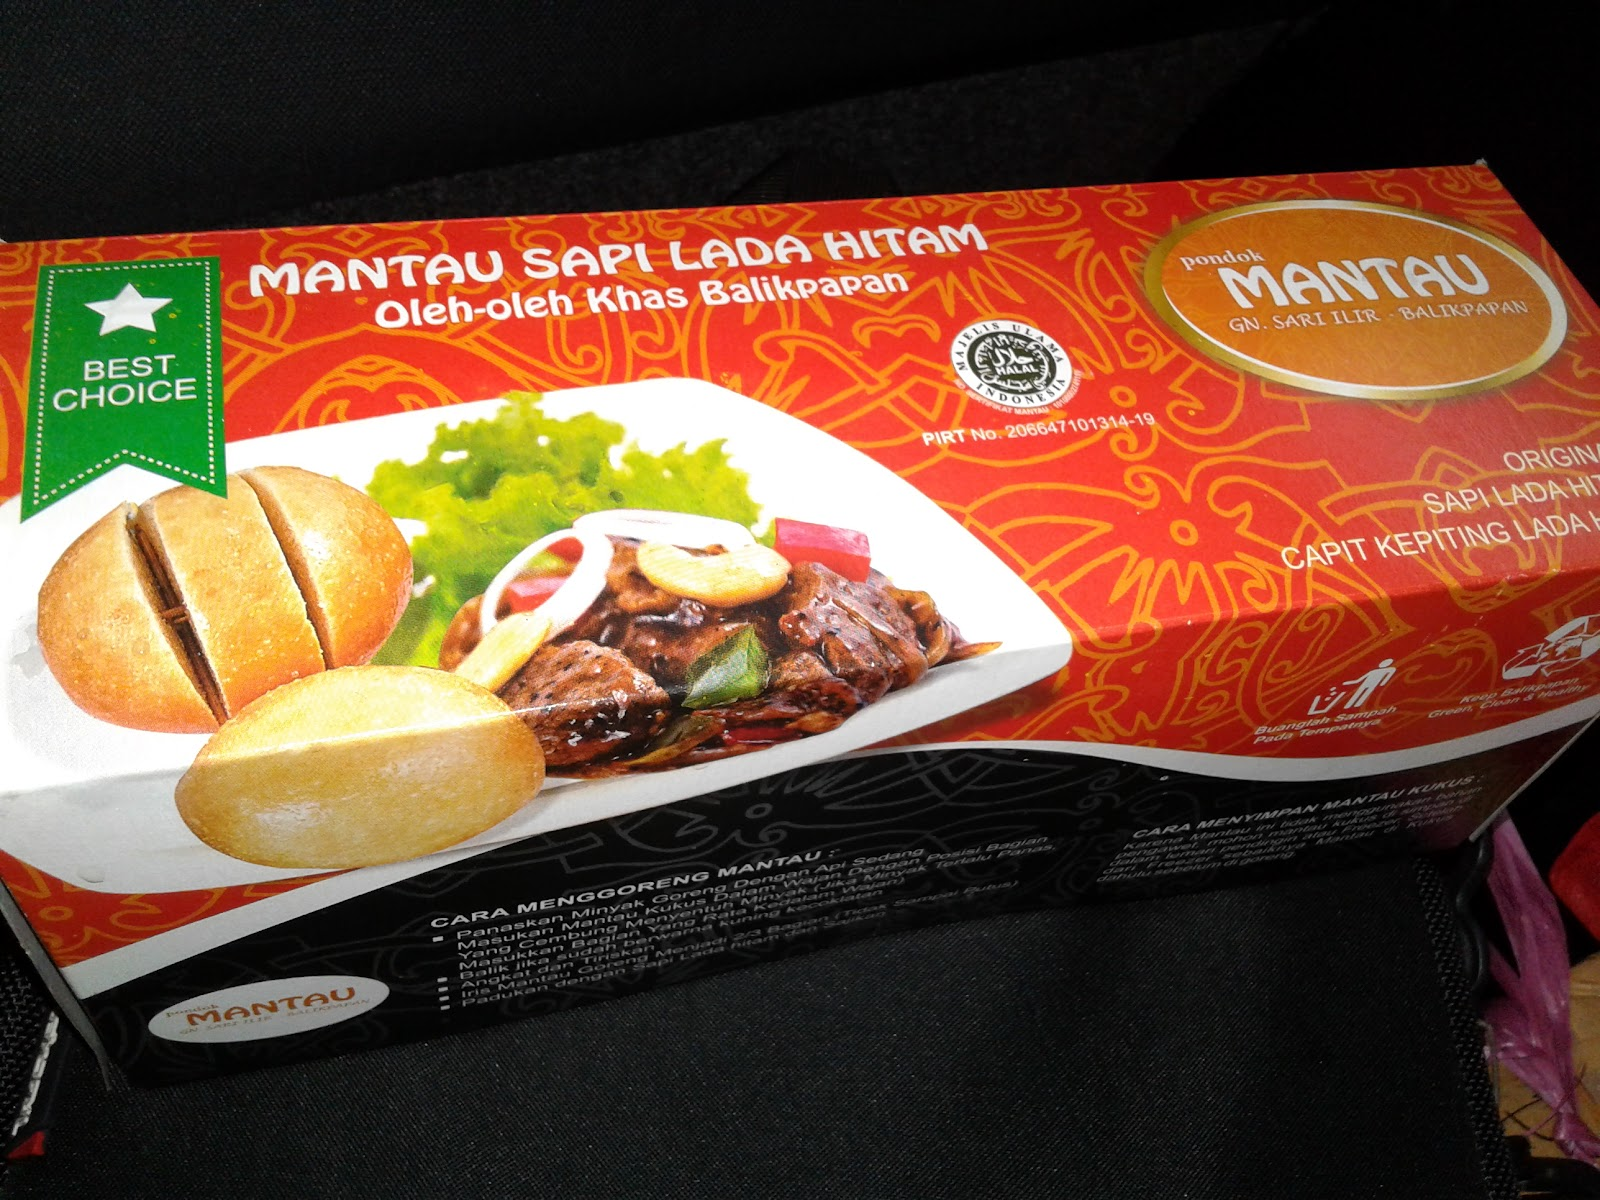 Roti Mantau Sapi Lada Hitam Oleh Oleh Khas Balikpapan Bangsaid